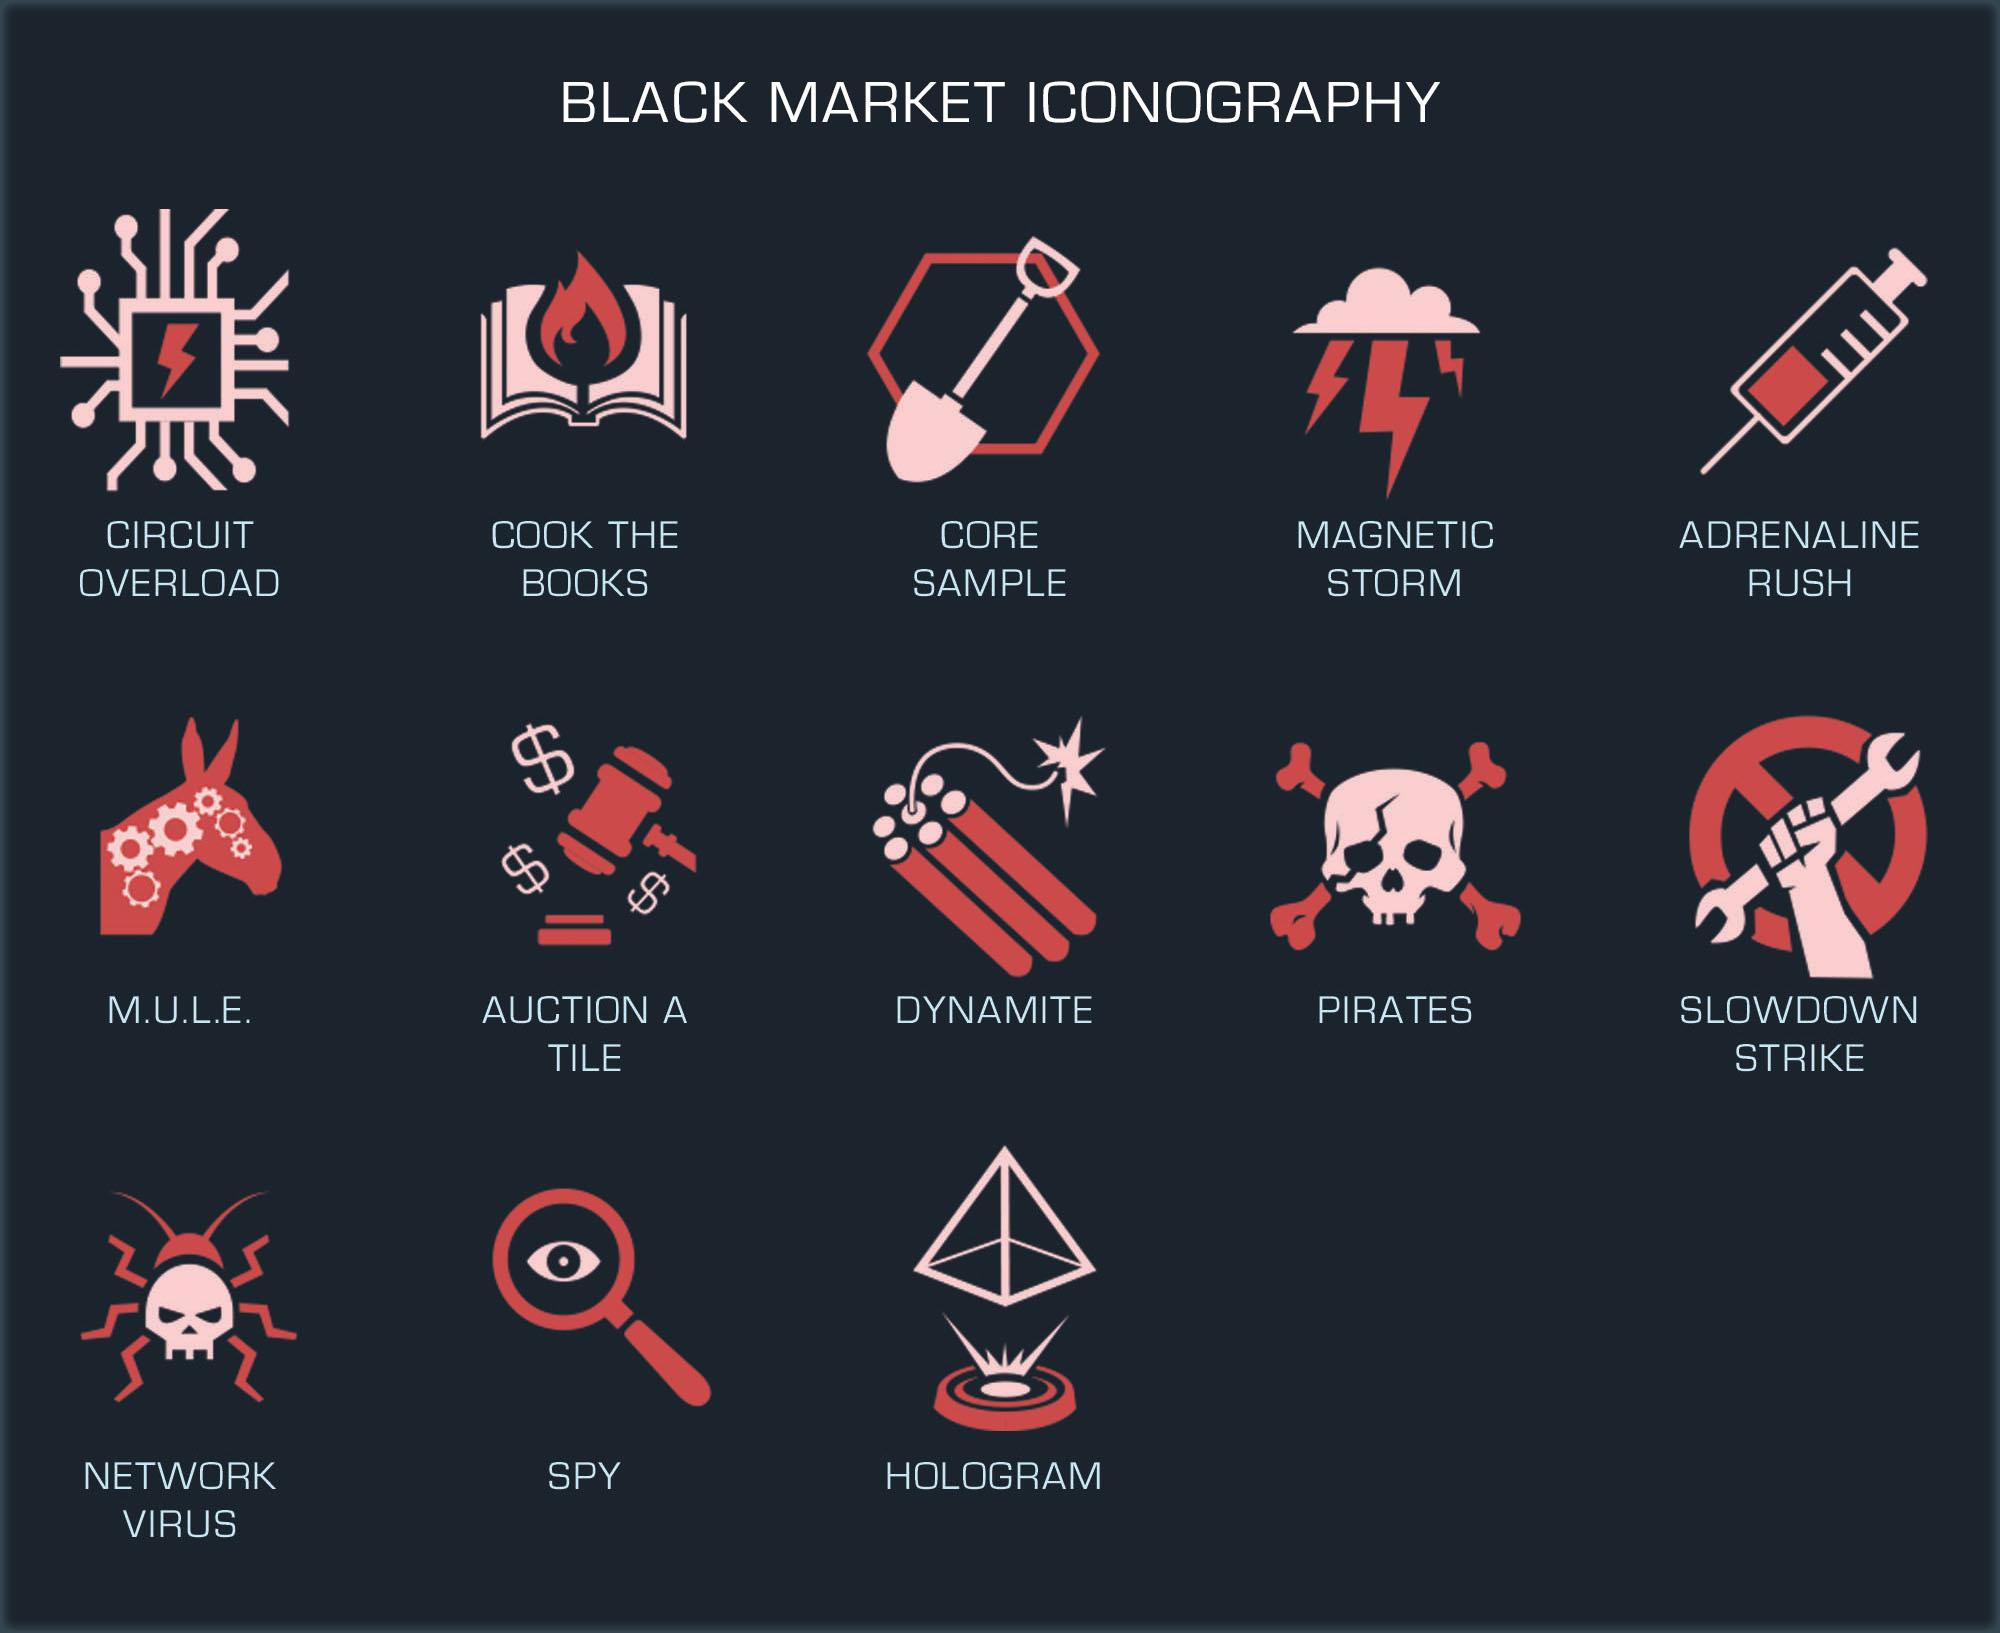 Black Market Iconography